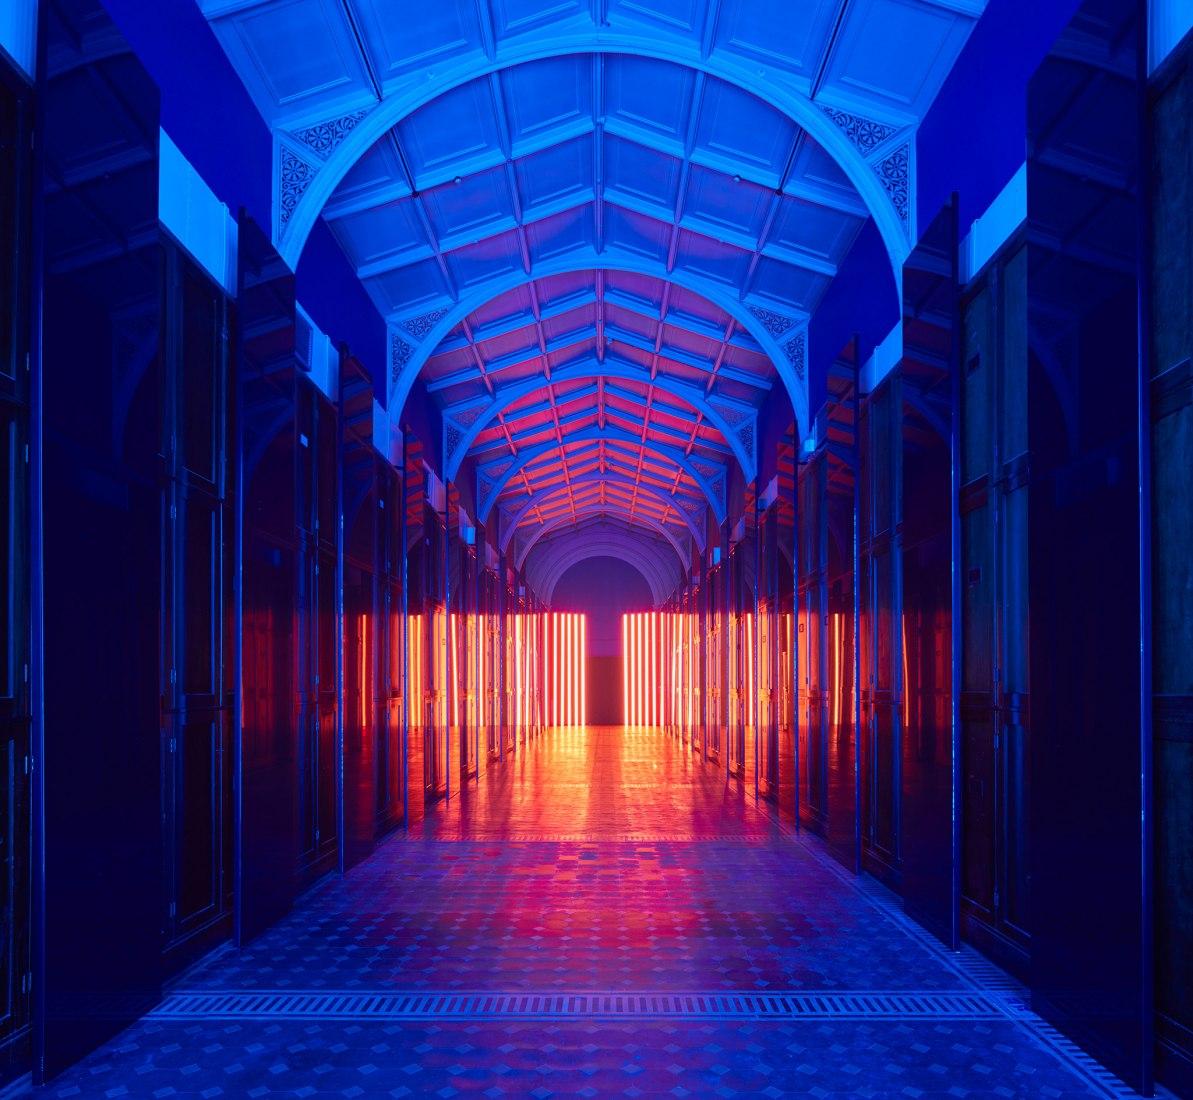 Reflection Room by Flynn Talbot. Photograph © Edmund Sumner. Image courtesy Londo Design Festival